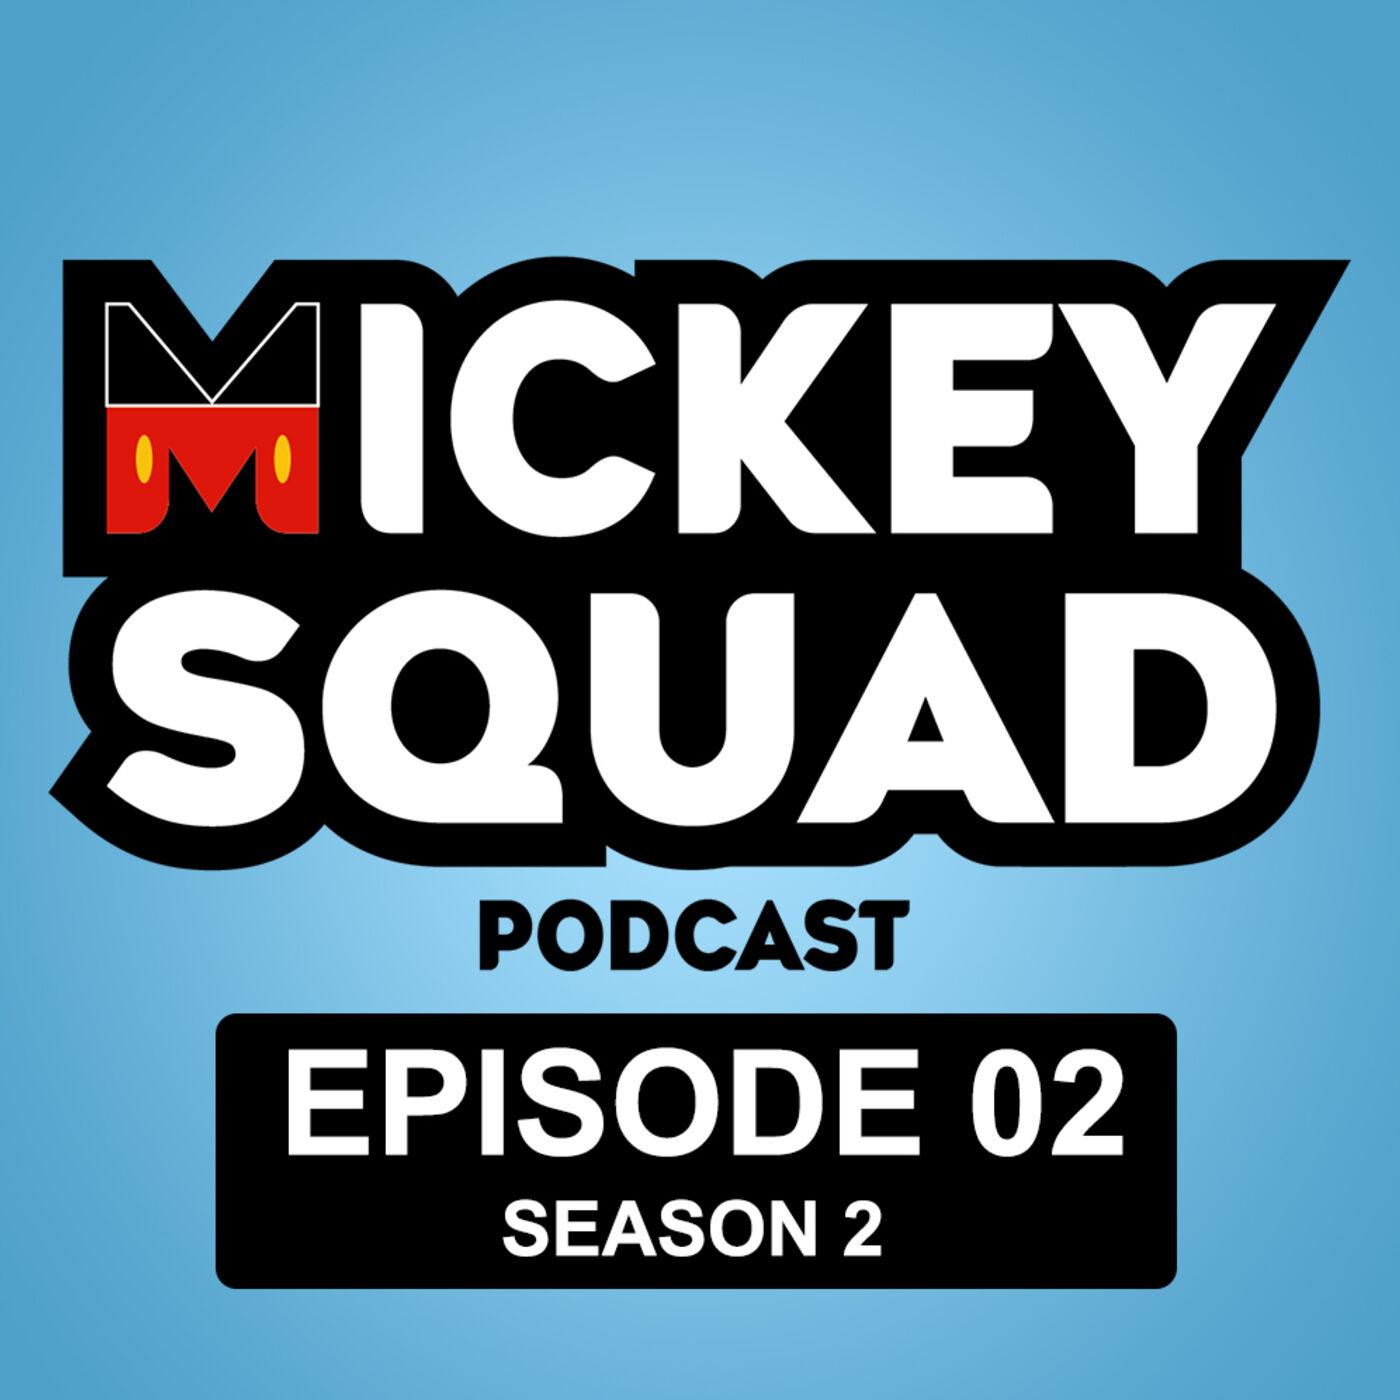 Season 02 - Episode 02 - Disneyland & COVID-19